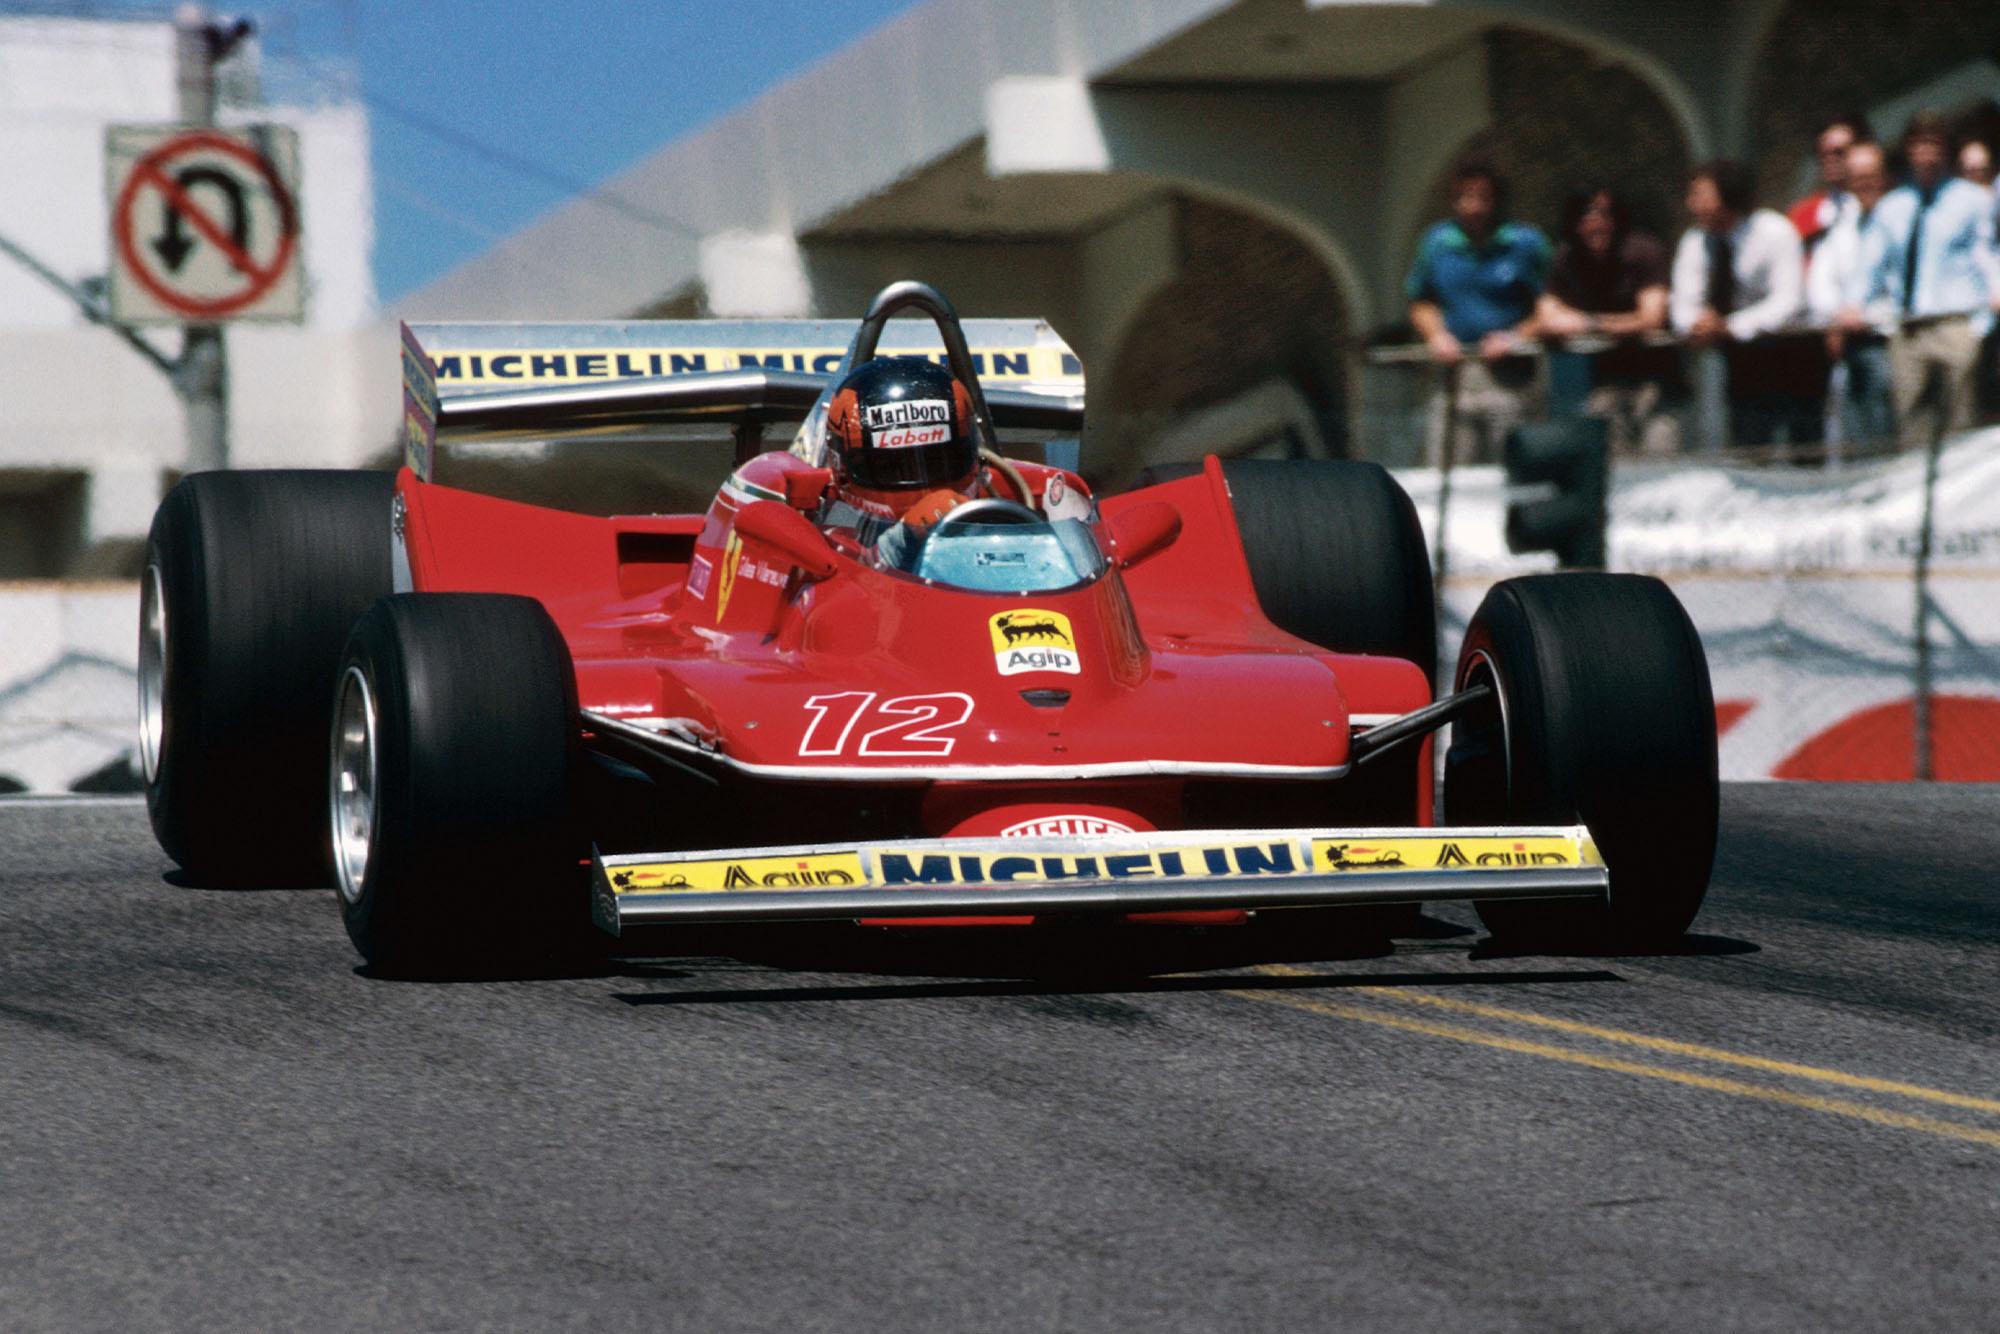 Gilles Villeneuve (Ferrari) driving at the 1979 United States Grand Prix West, Long Beach.